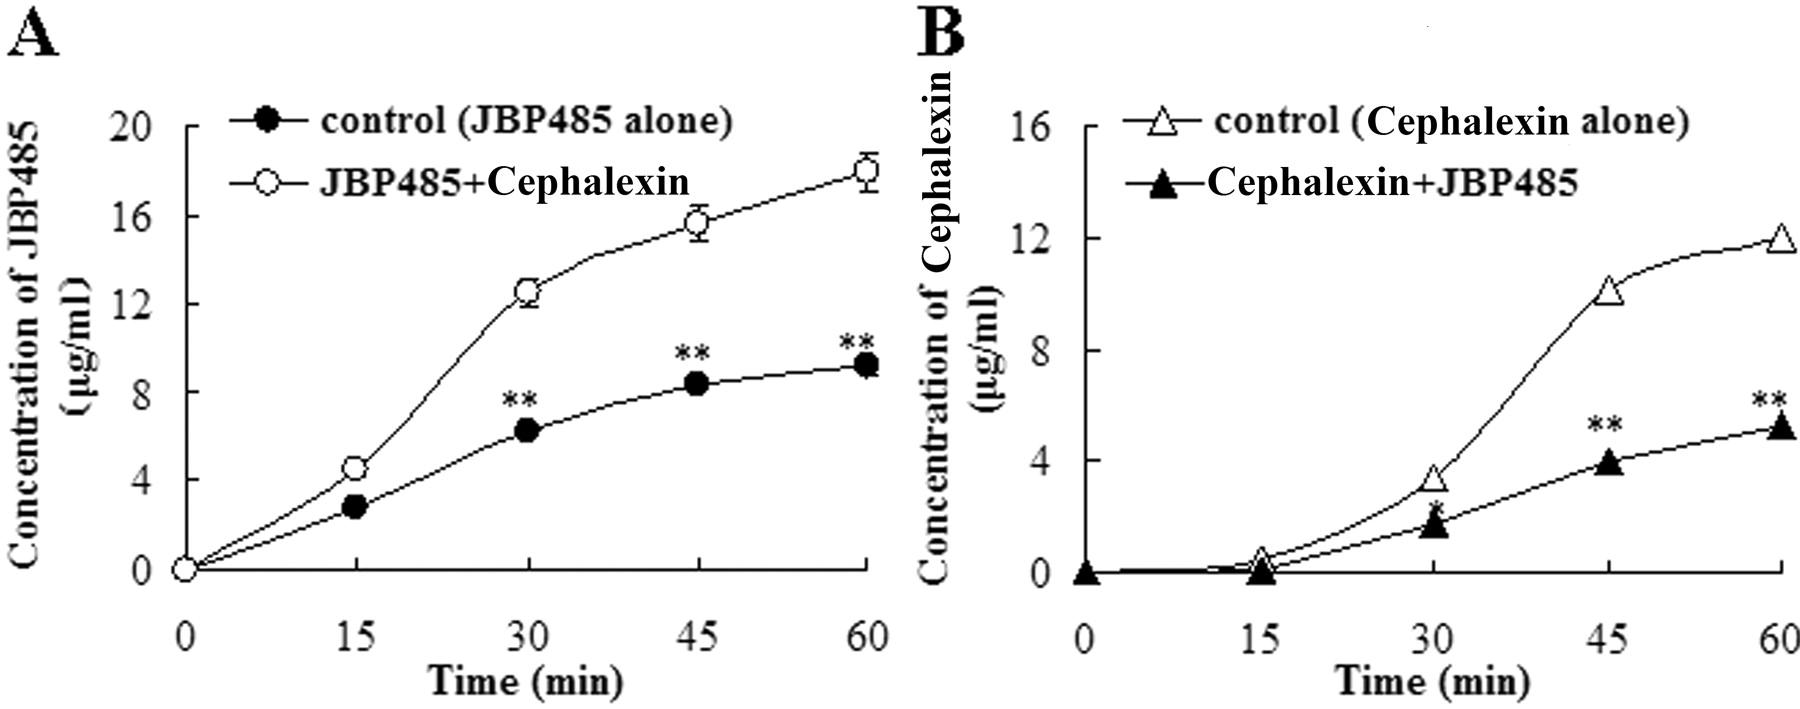 metoclopramide 10 mg cost